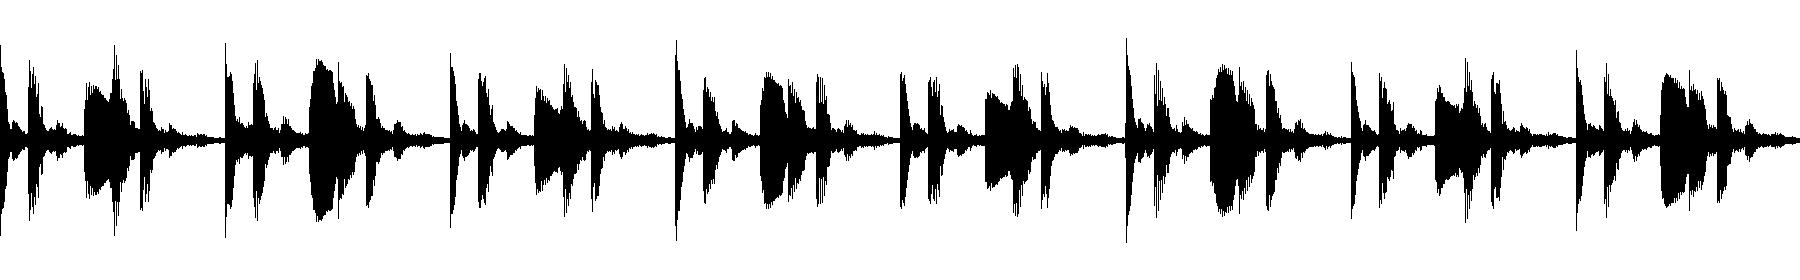 dts chordlp 25b cm wet